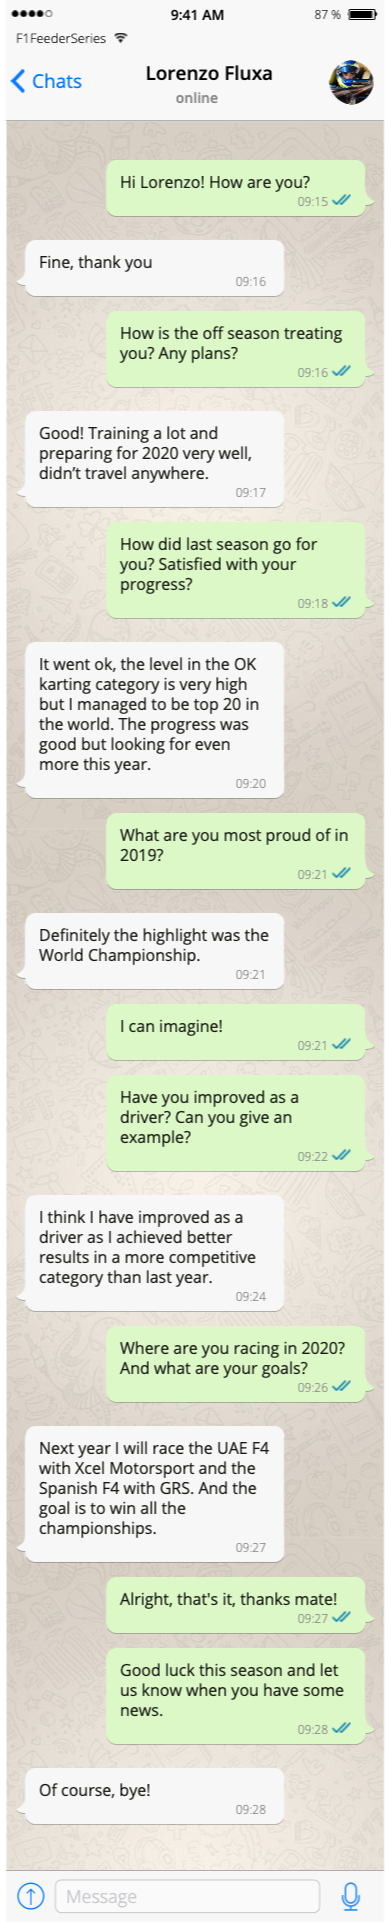 WhatsApp interview Lorenzo Fluxa